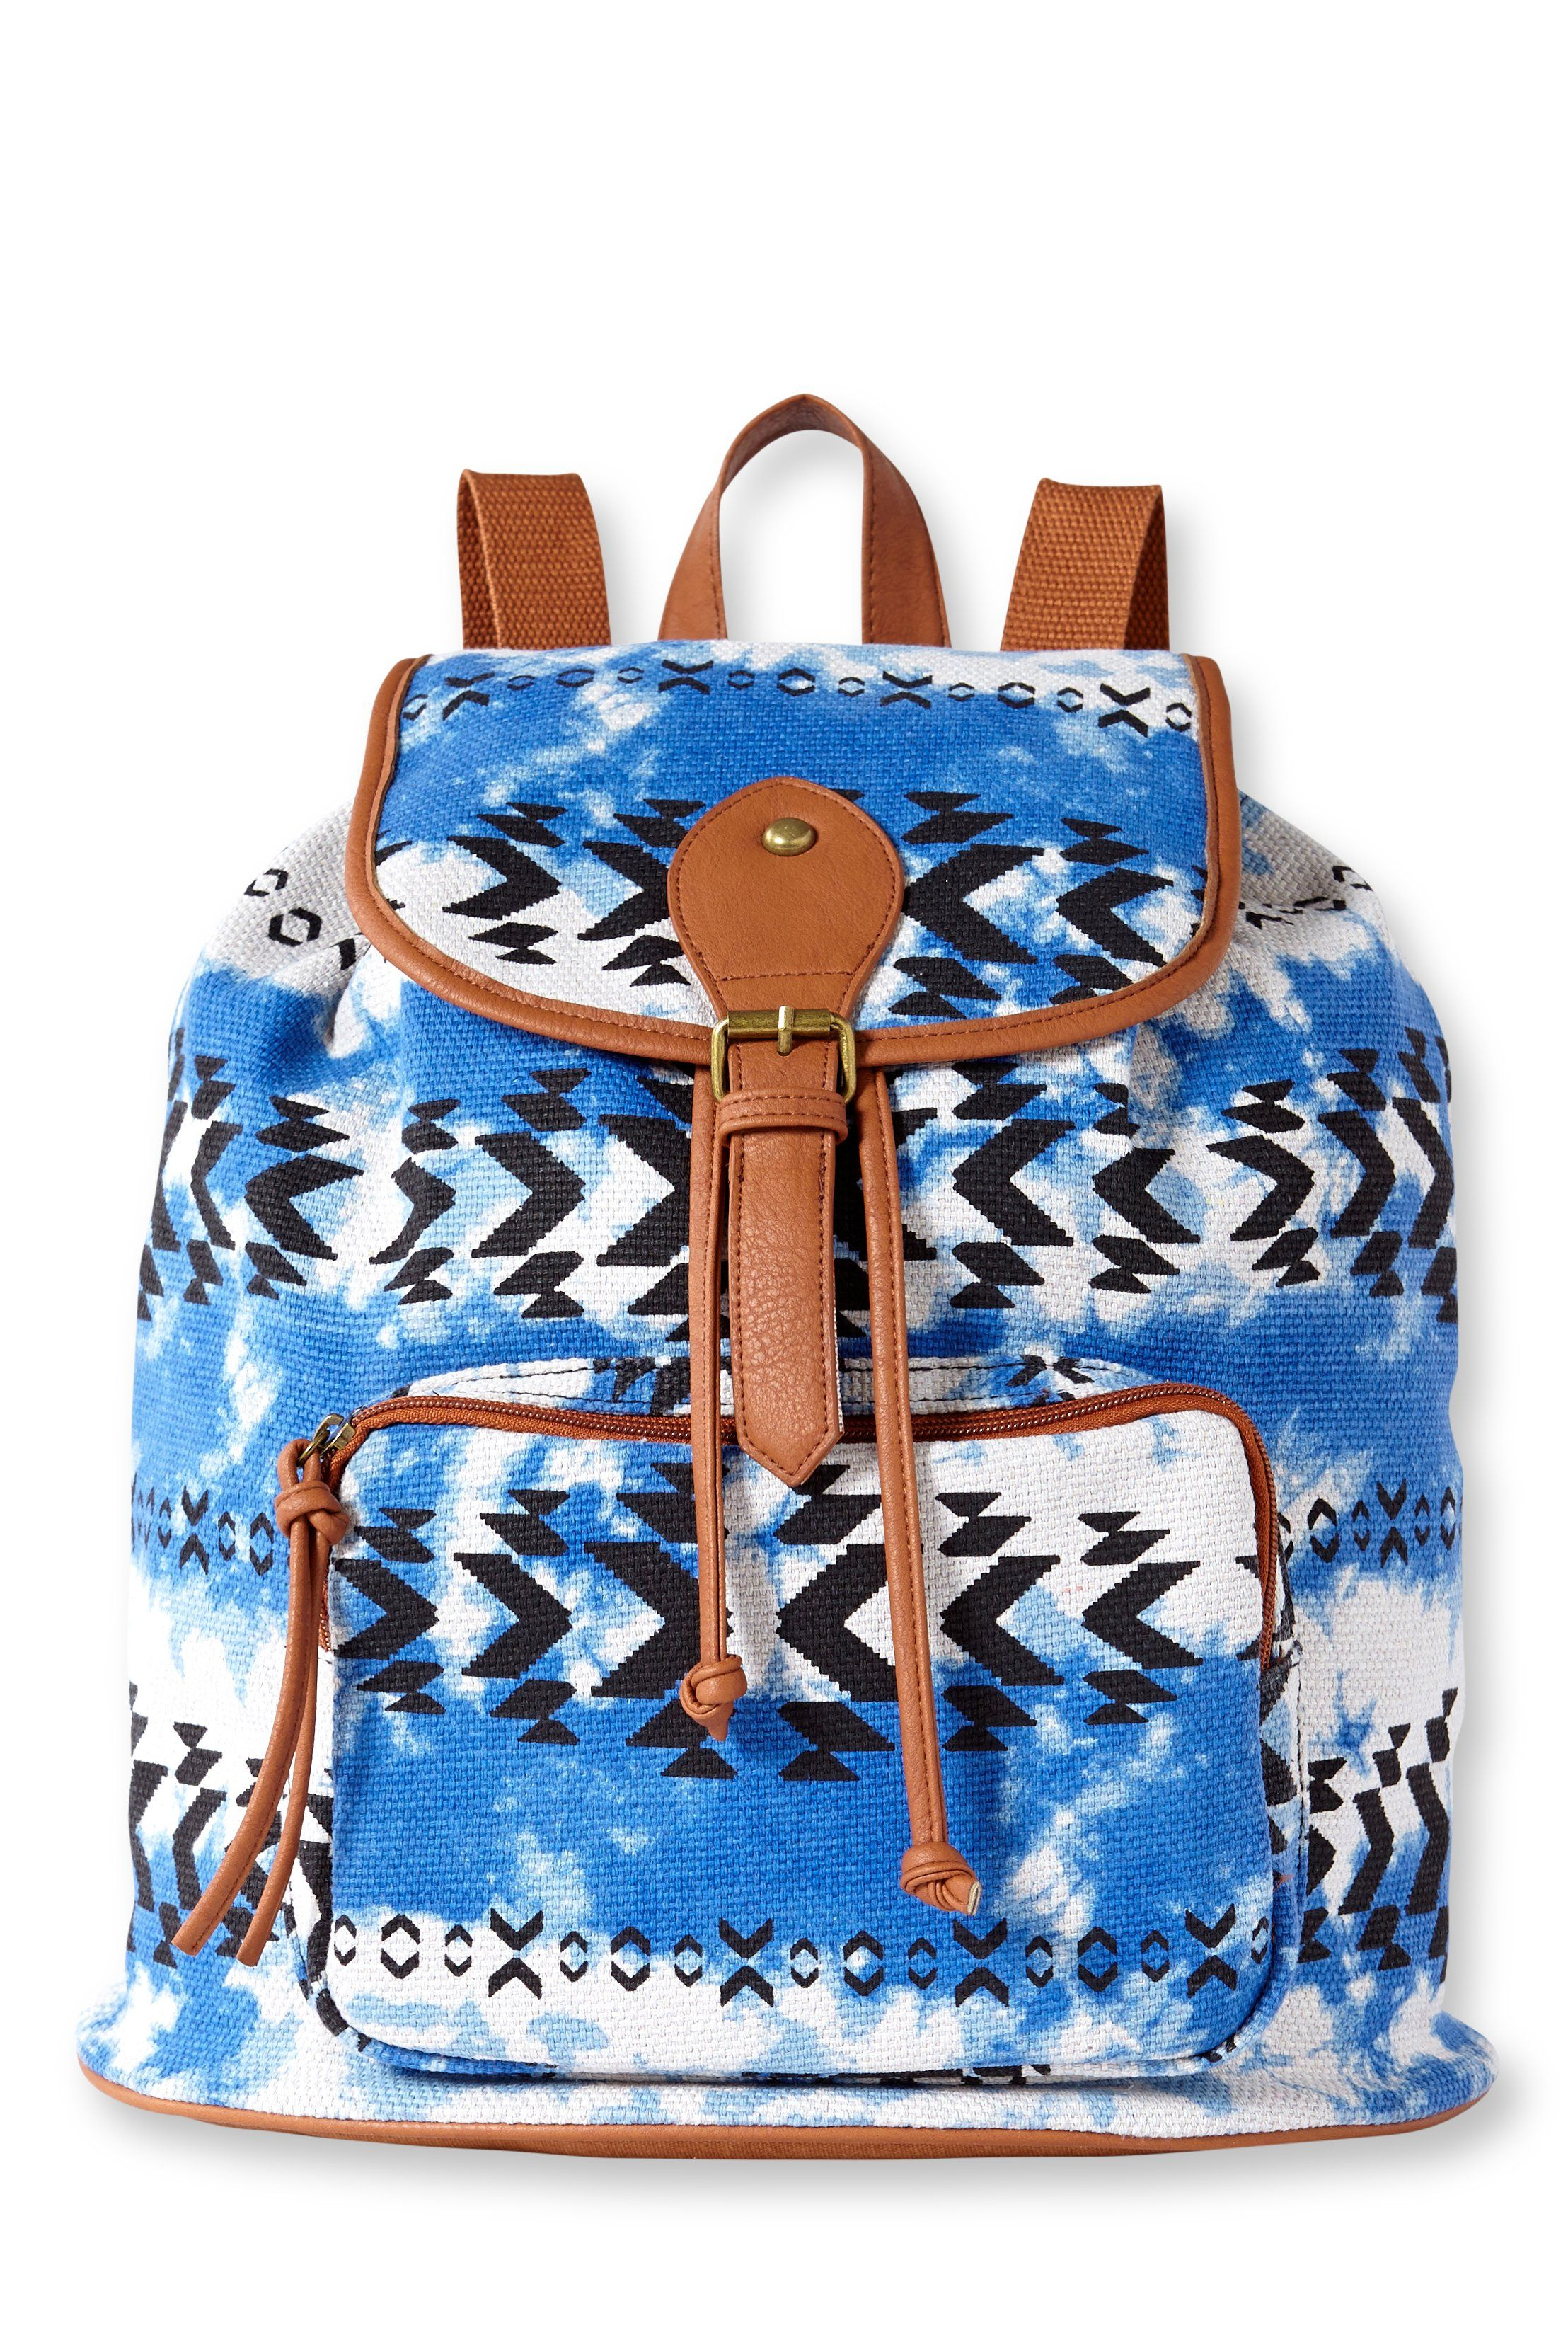 24 trendy backtoschool backpacks stylish backpacks